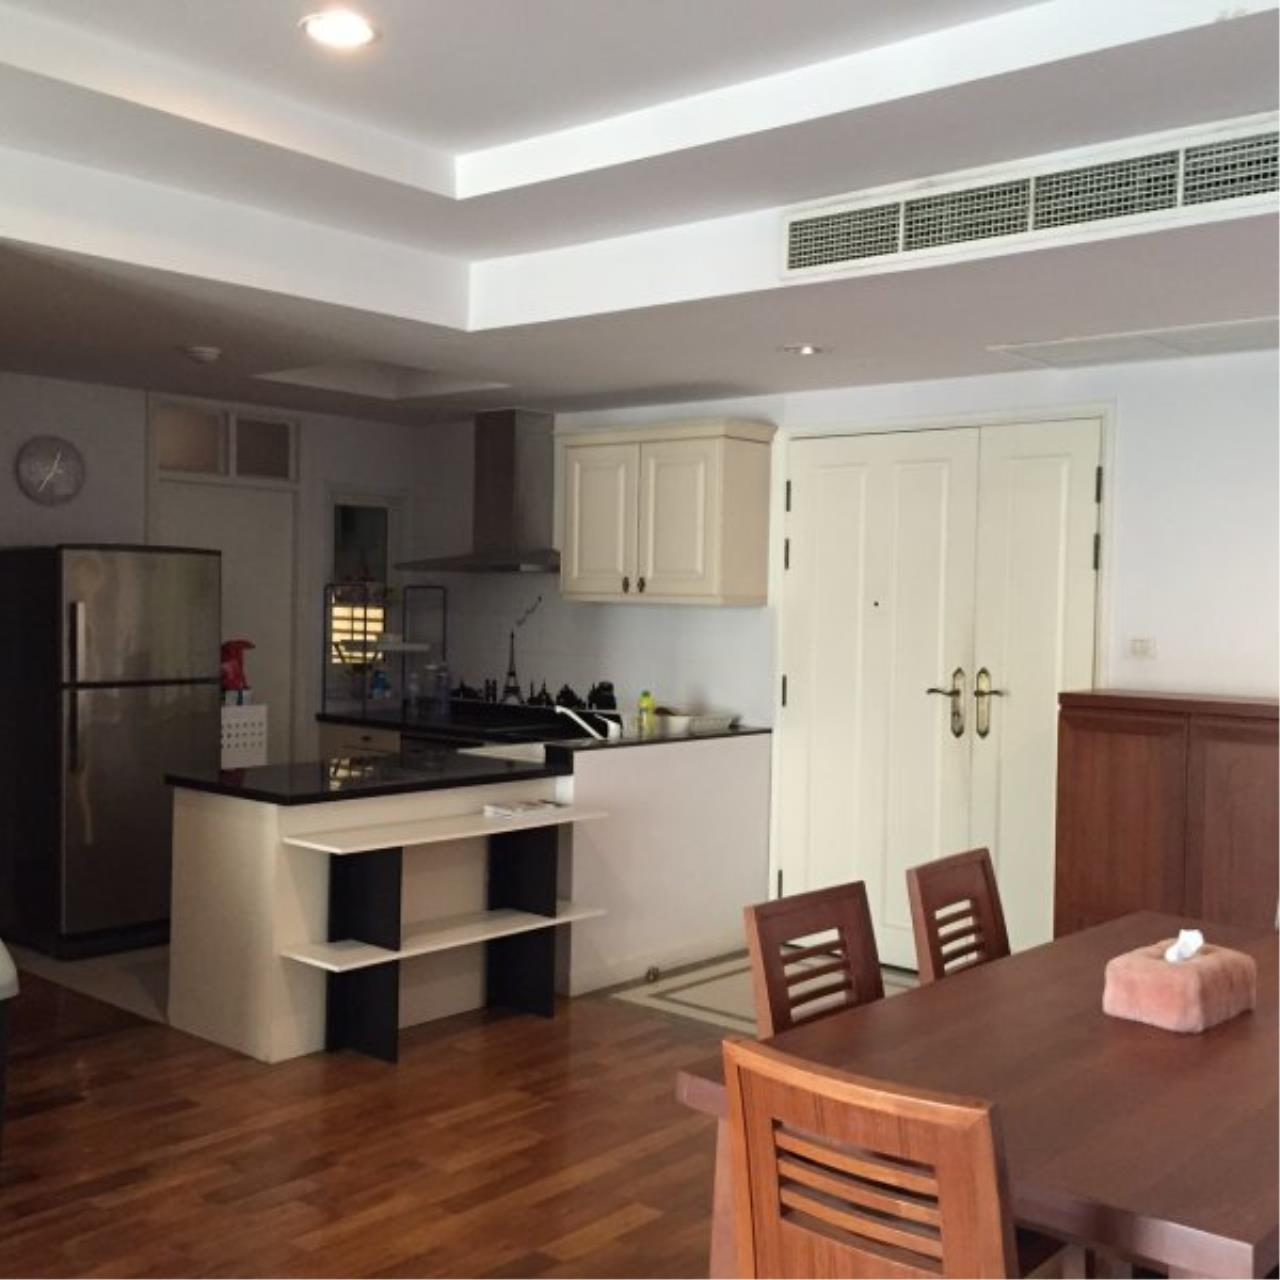 Piri Property Agency's Modern 2 Bedrooms in the Baan Nunthasiri Condo for sale on mid floor 1